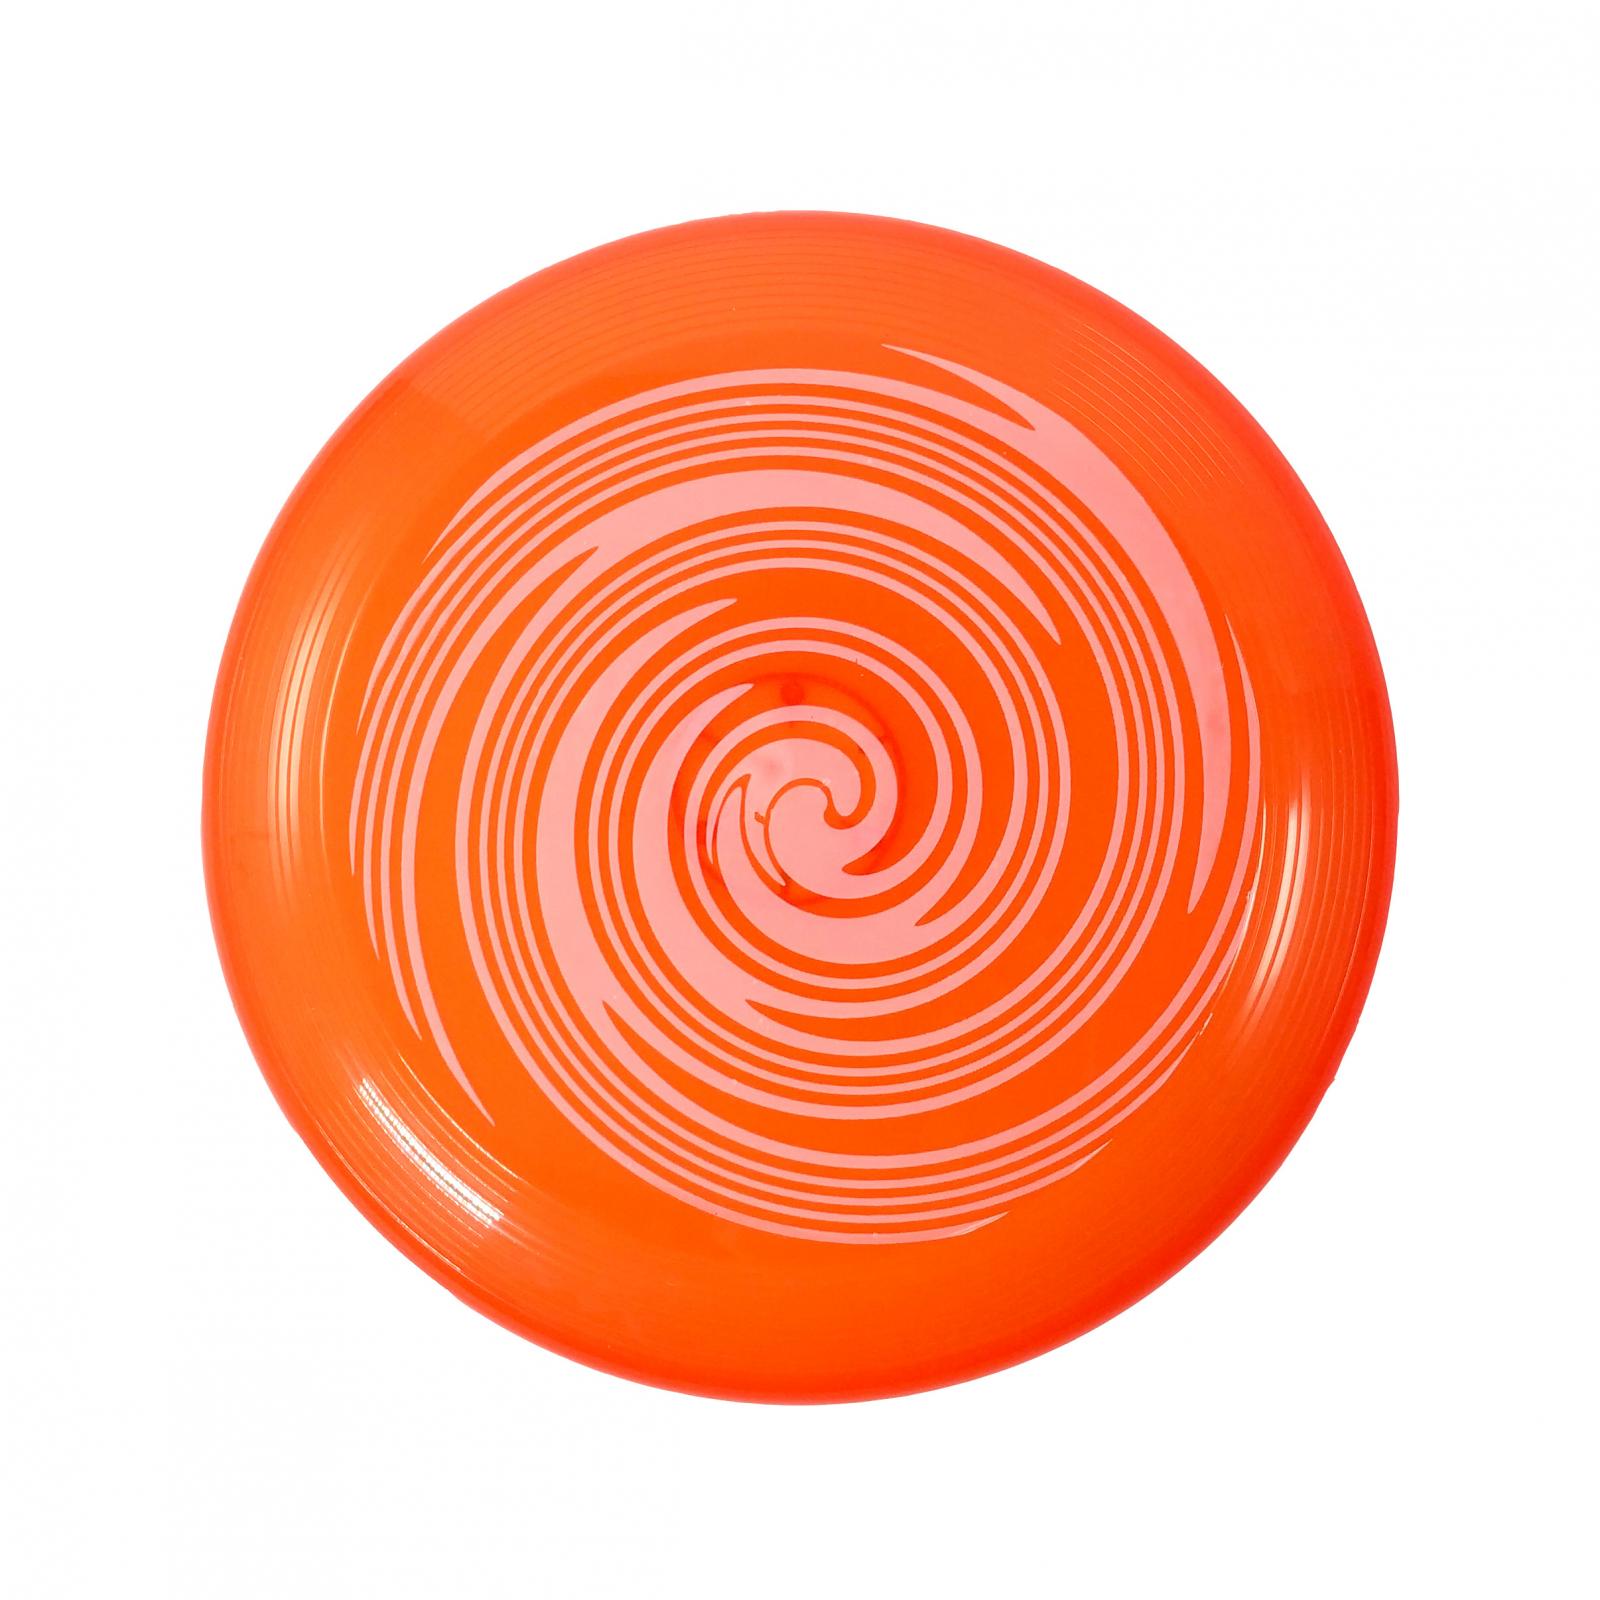 TychoTyke Kids Classic Flying Disc Light Up Toy - Orange